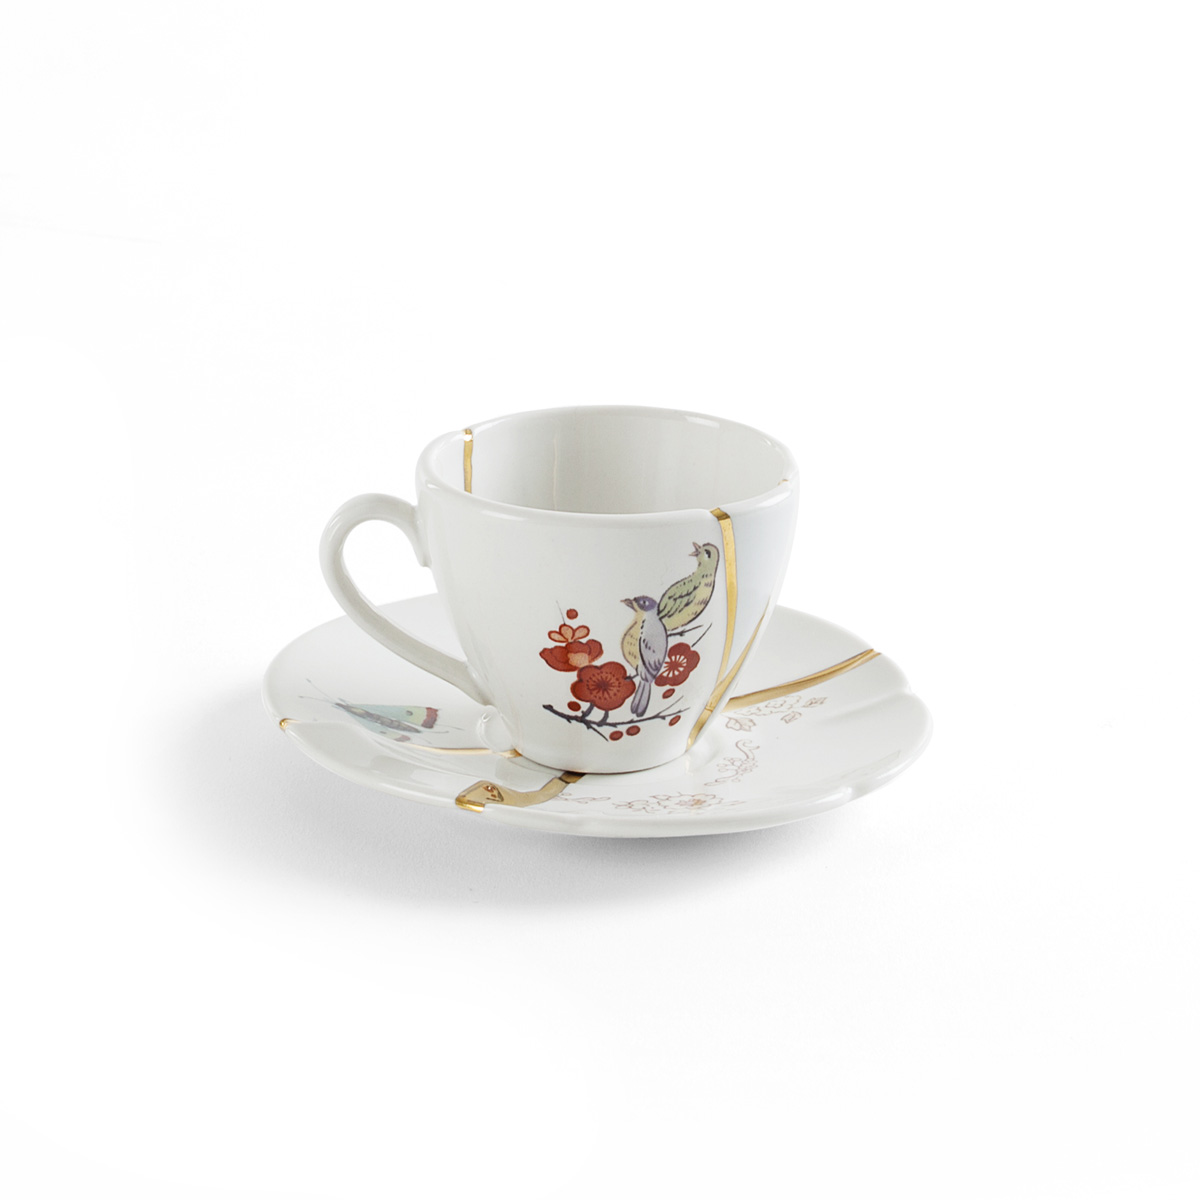 Seletti - KINTSUGI - Tazzina Caffè n°2 in porcellana